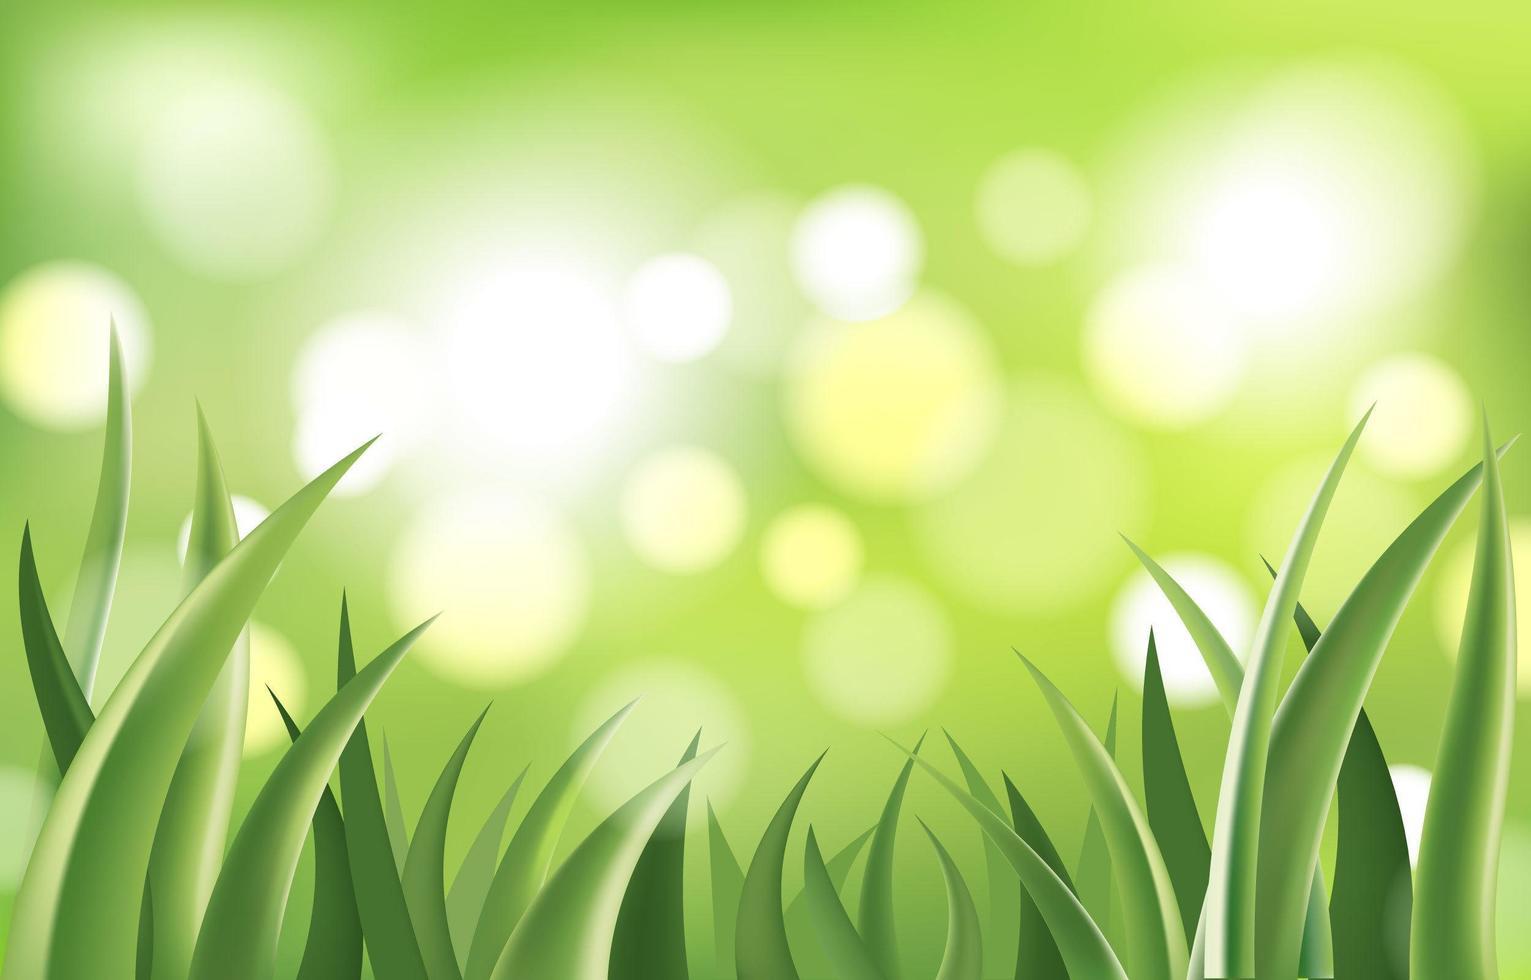 abstract groen gras op bokeh achtergrond vector